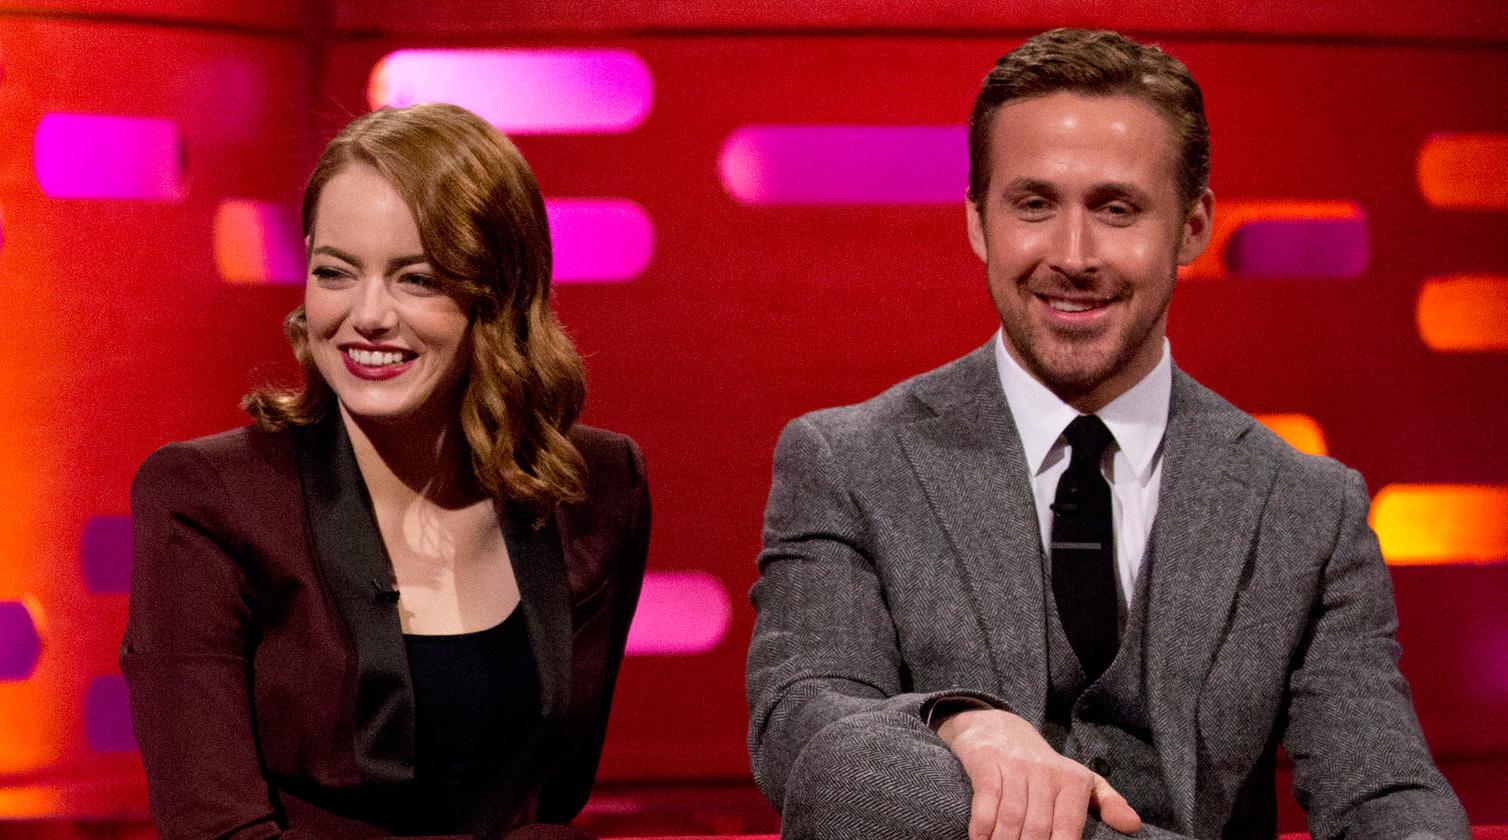 Ryan Gosling Emma Stone Dancing